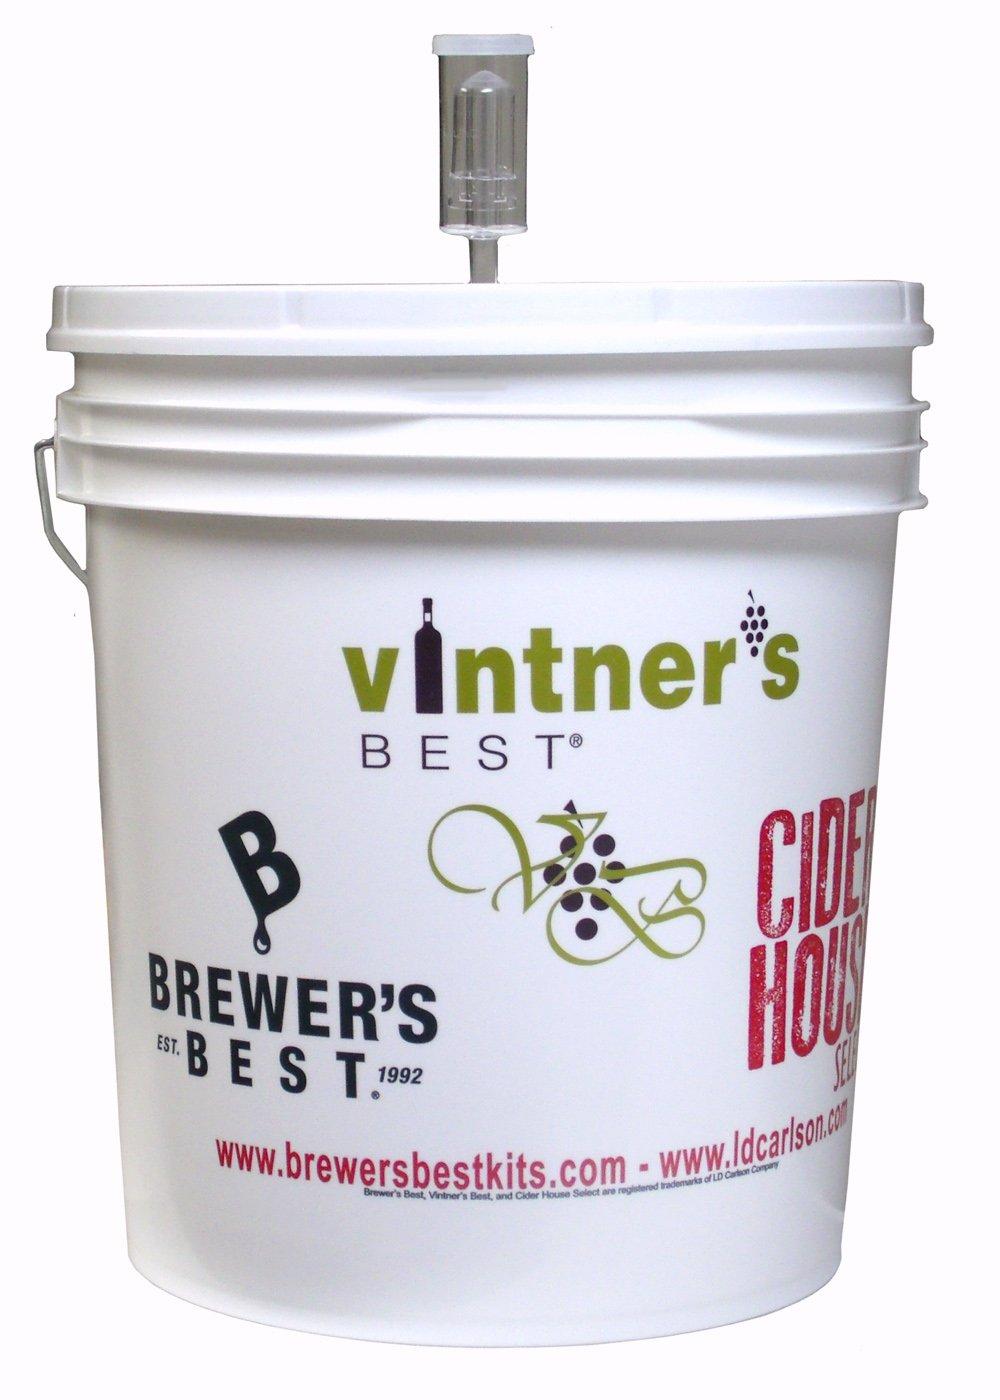 7.9 Gallon Plastic Fermenting Bucket with Lid & Air Lock